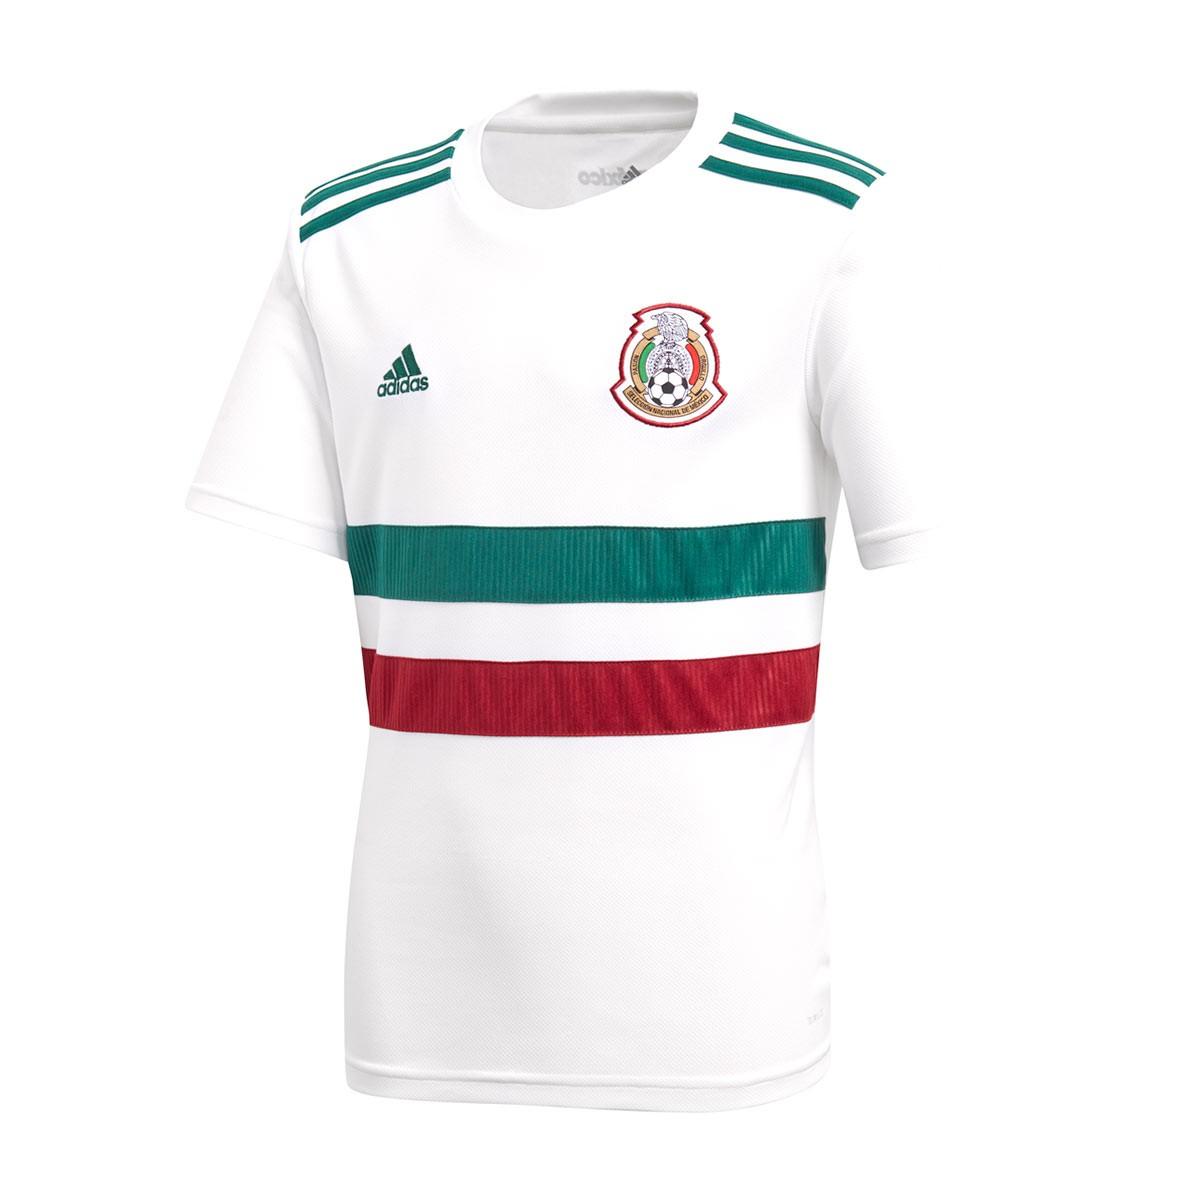 79416ec2037b6 Camiseta adidas México Segunda Equipación 2017-2018 Niño White-Collegiate  green-Collegiate burgundy - Tienda de fútbol Fútbol Emotion